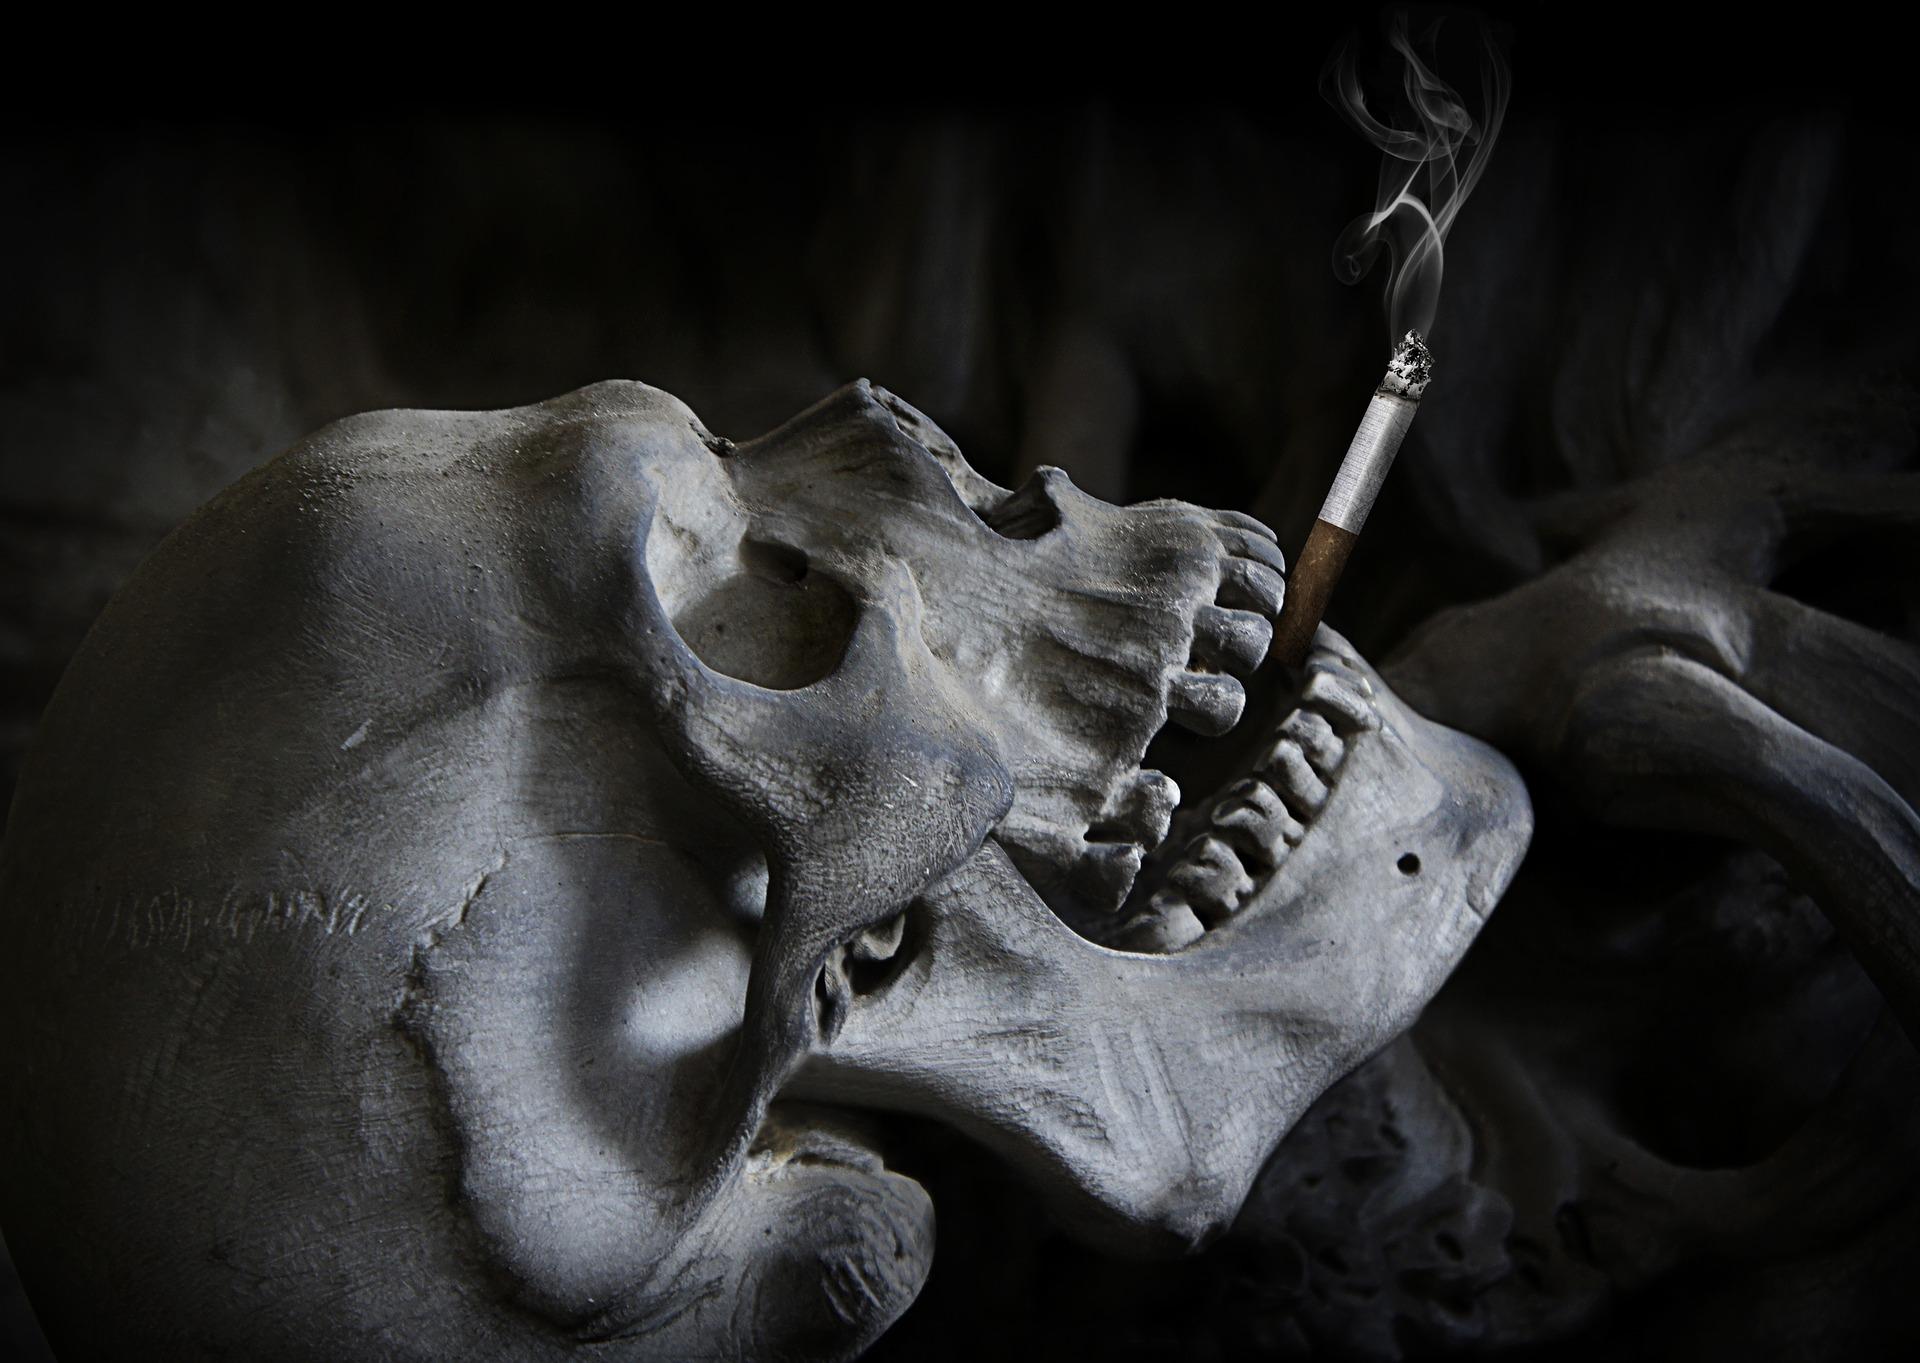 How Cigarette Marketing Killed 20 Million People